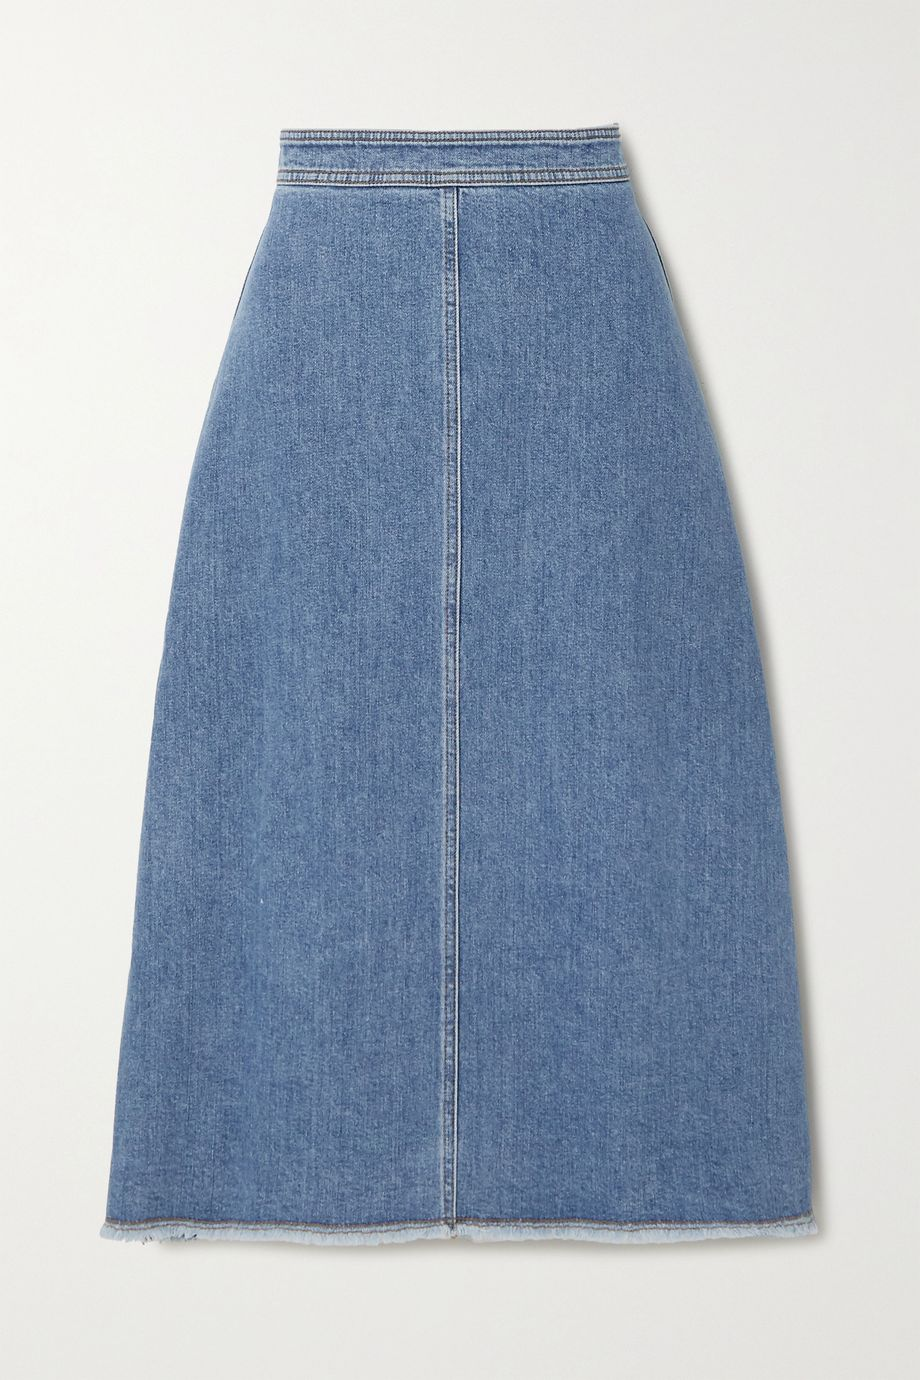 Philosophy di Lorenzo Serafini Frayed denim skirt